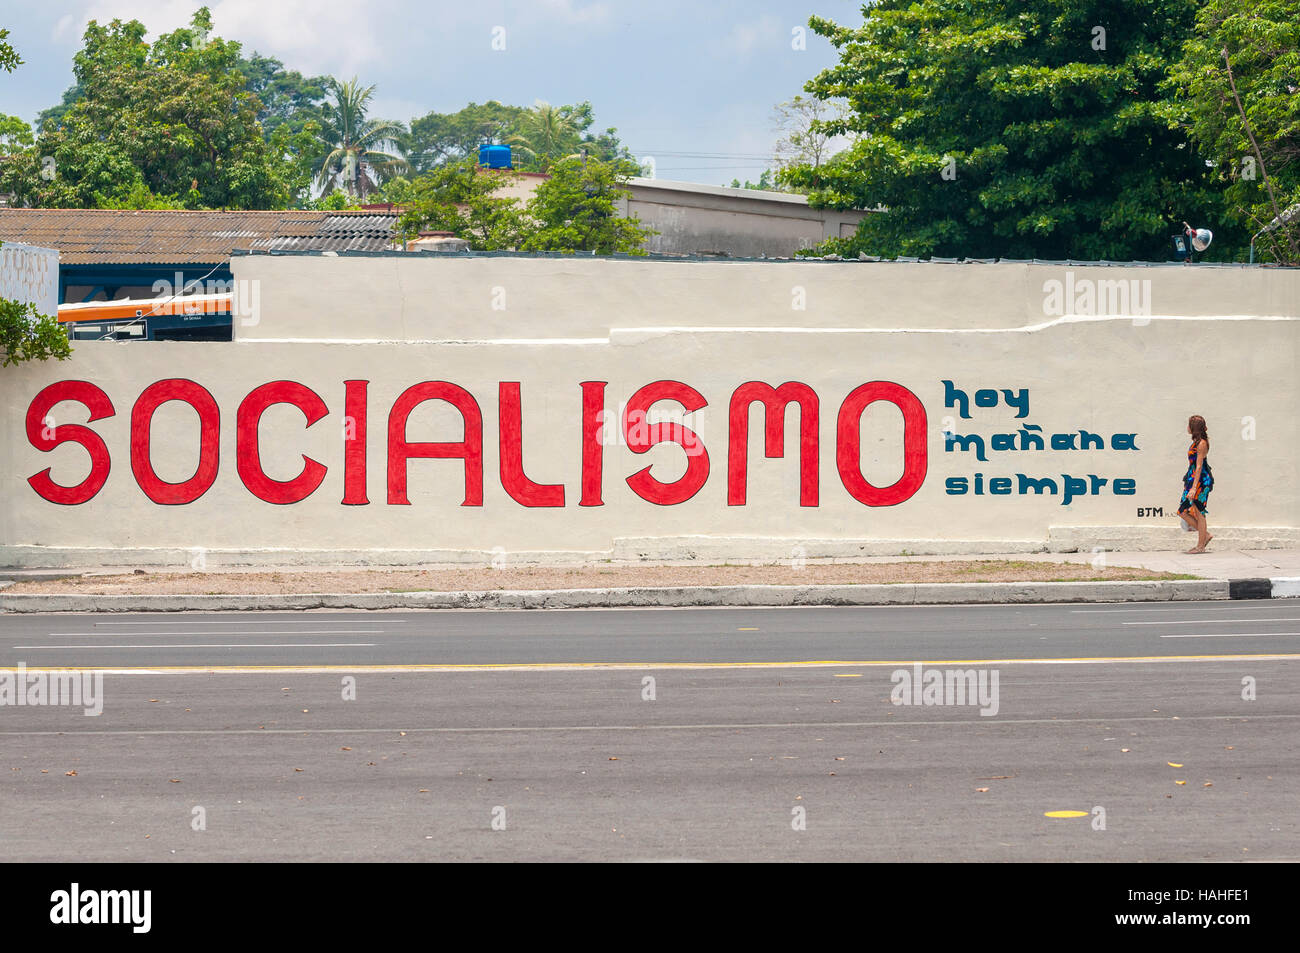 HAVANA, CUBA - JUNE, 2011: Propaganda mural promotes Socialism (today, tomorrow, always) on a street in Centro. Stock Photo